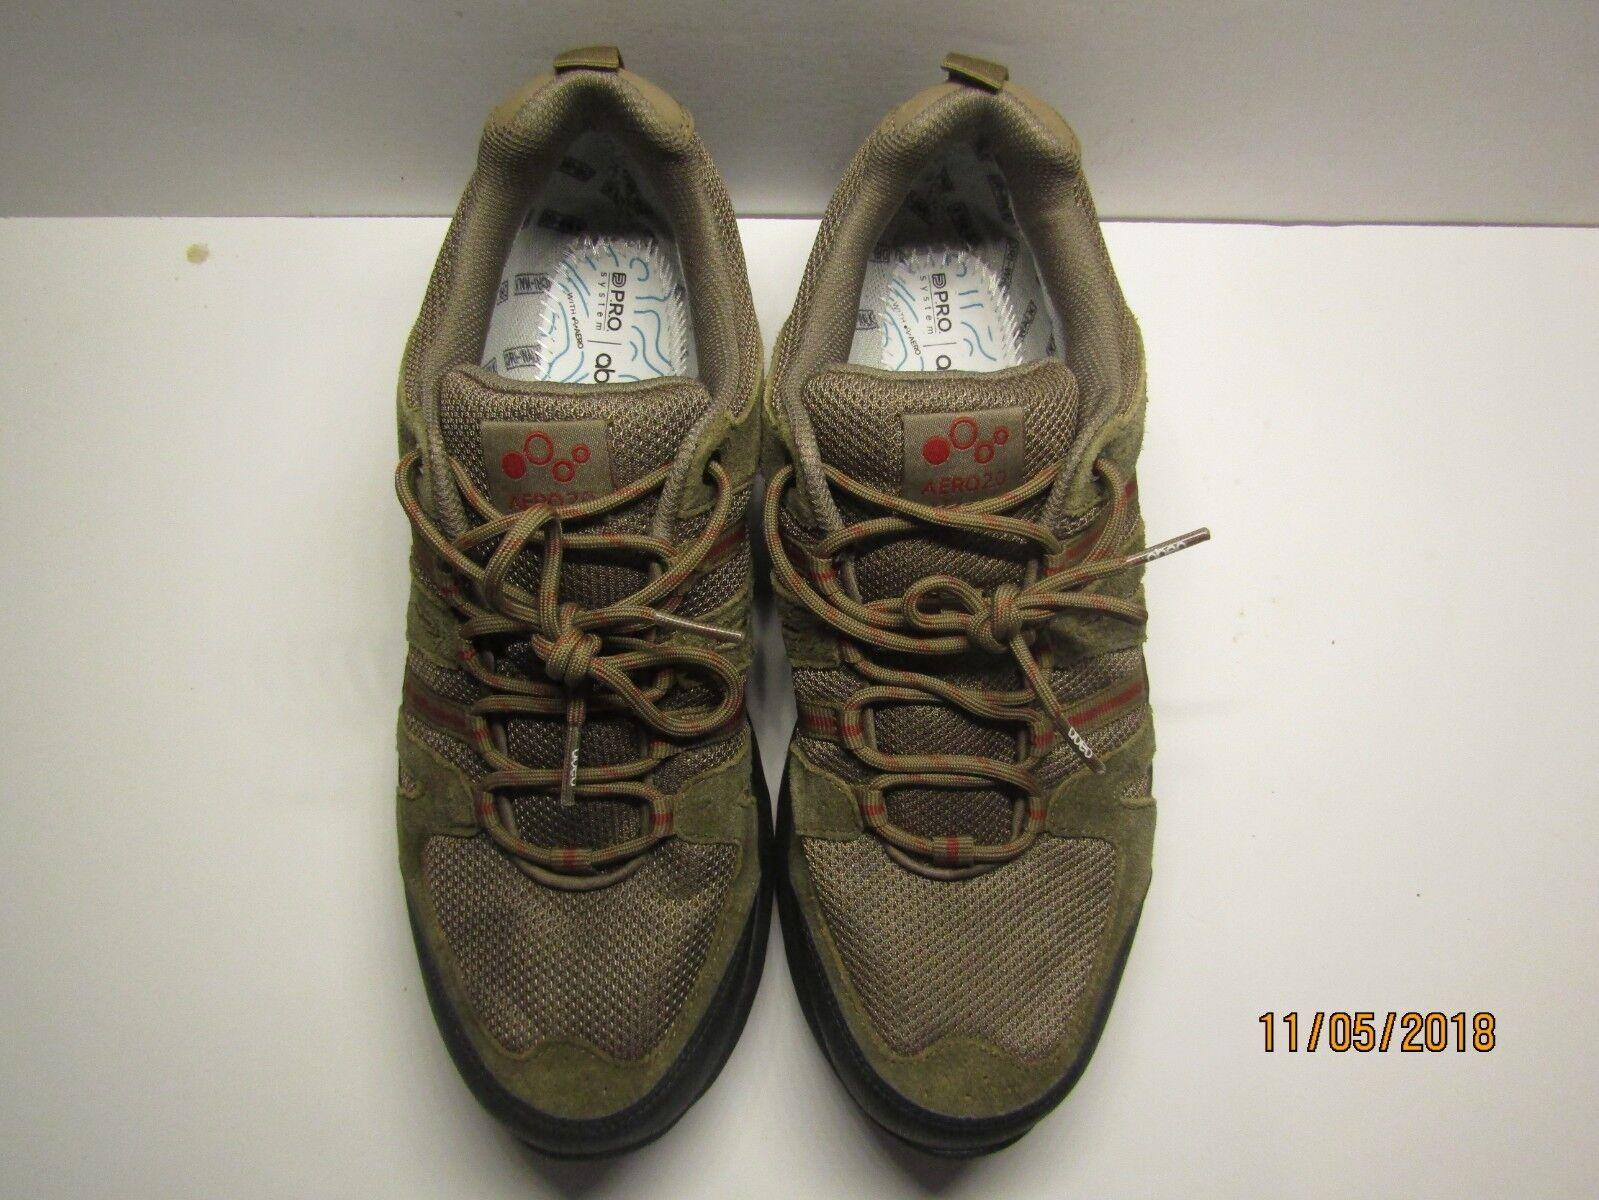 ABEO Jimmy Men's Hiking shoes - Khaki - Size 9.5 9.5 9.5 M ( MSRP    179.95 ) 0ed1b0